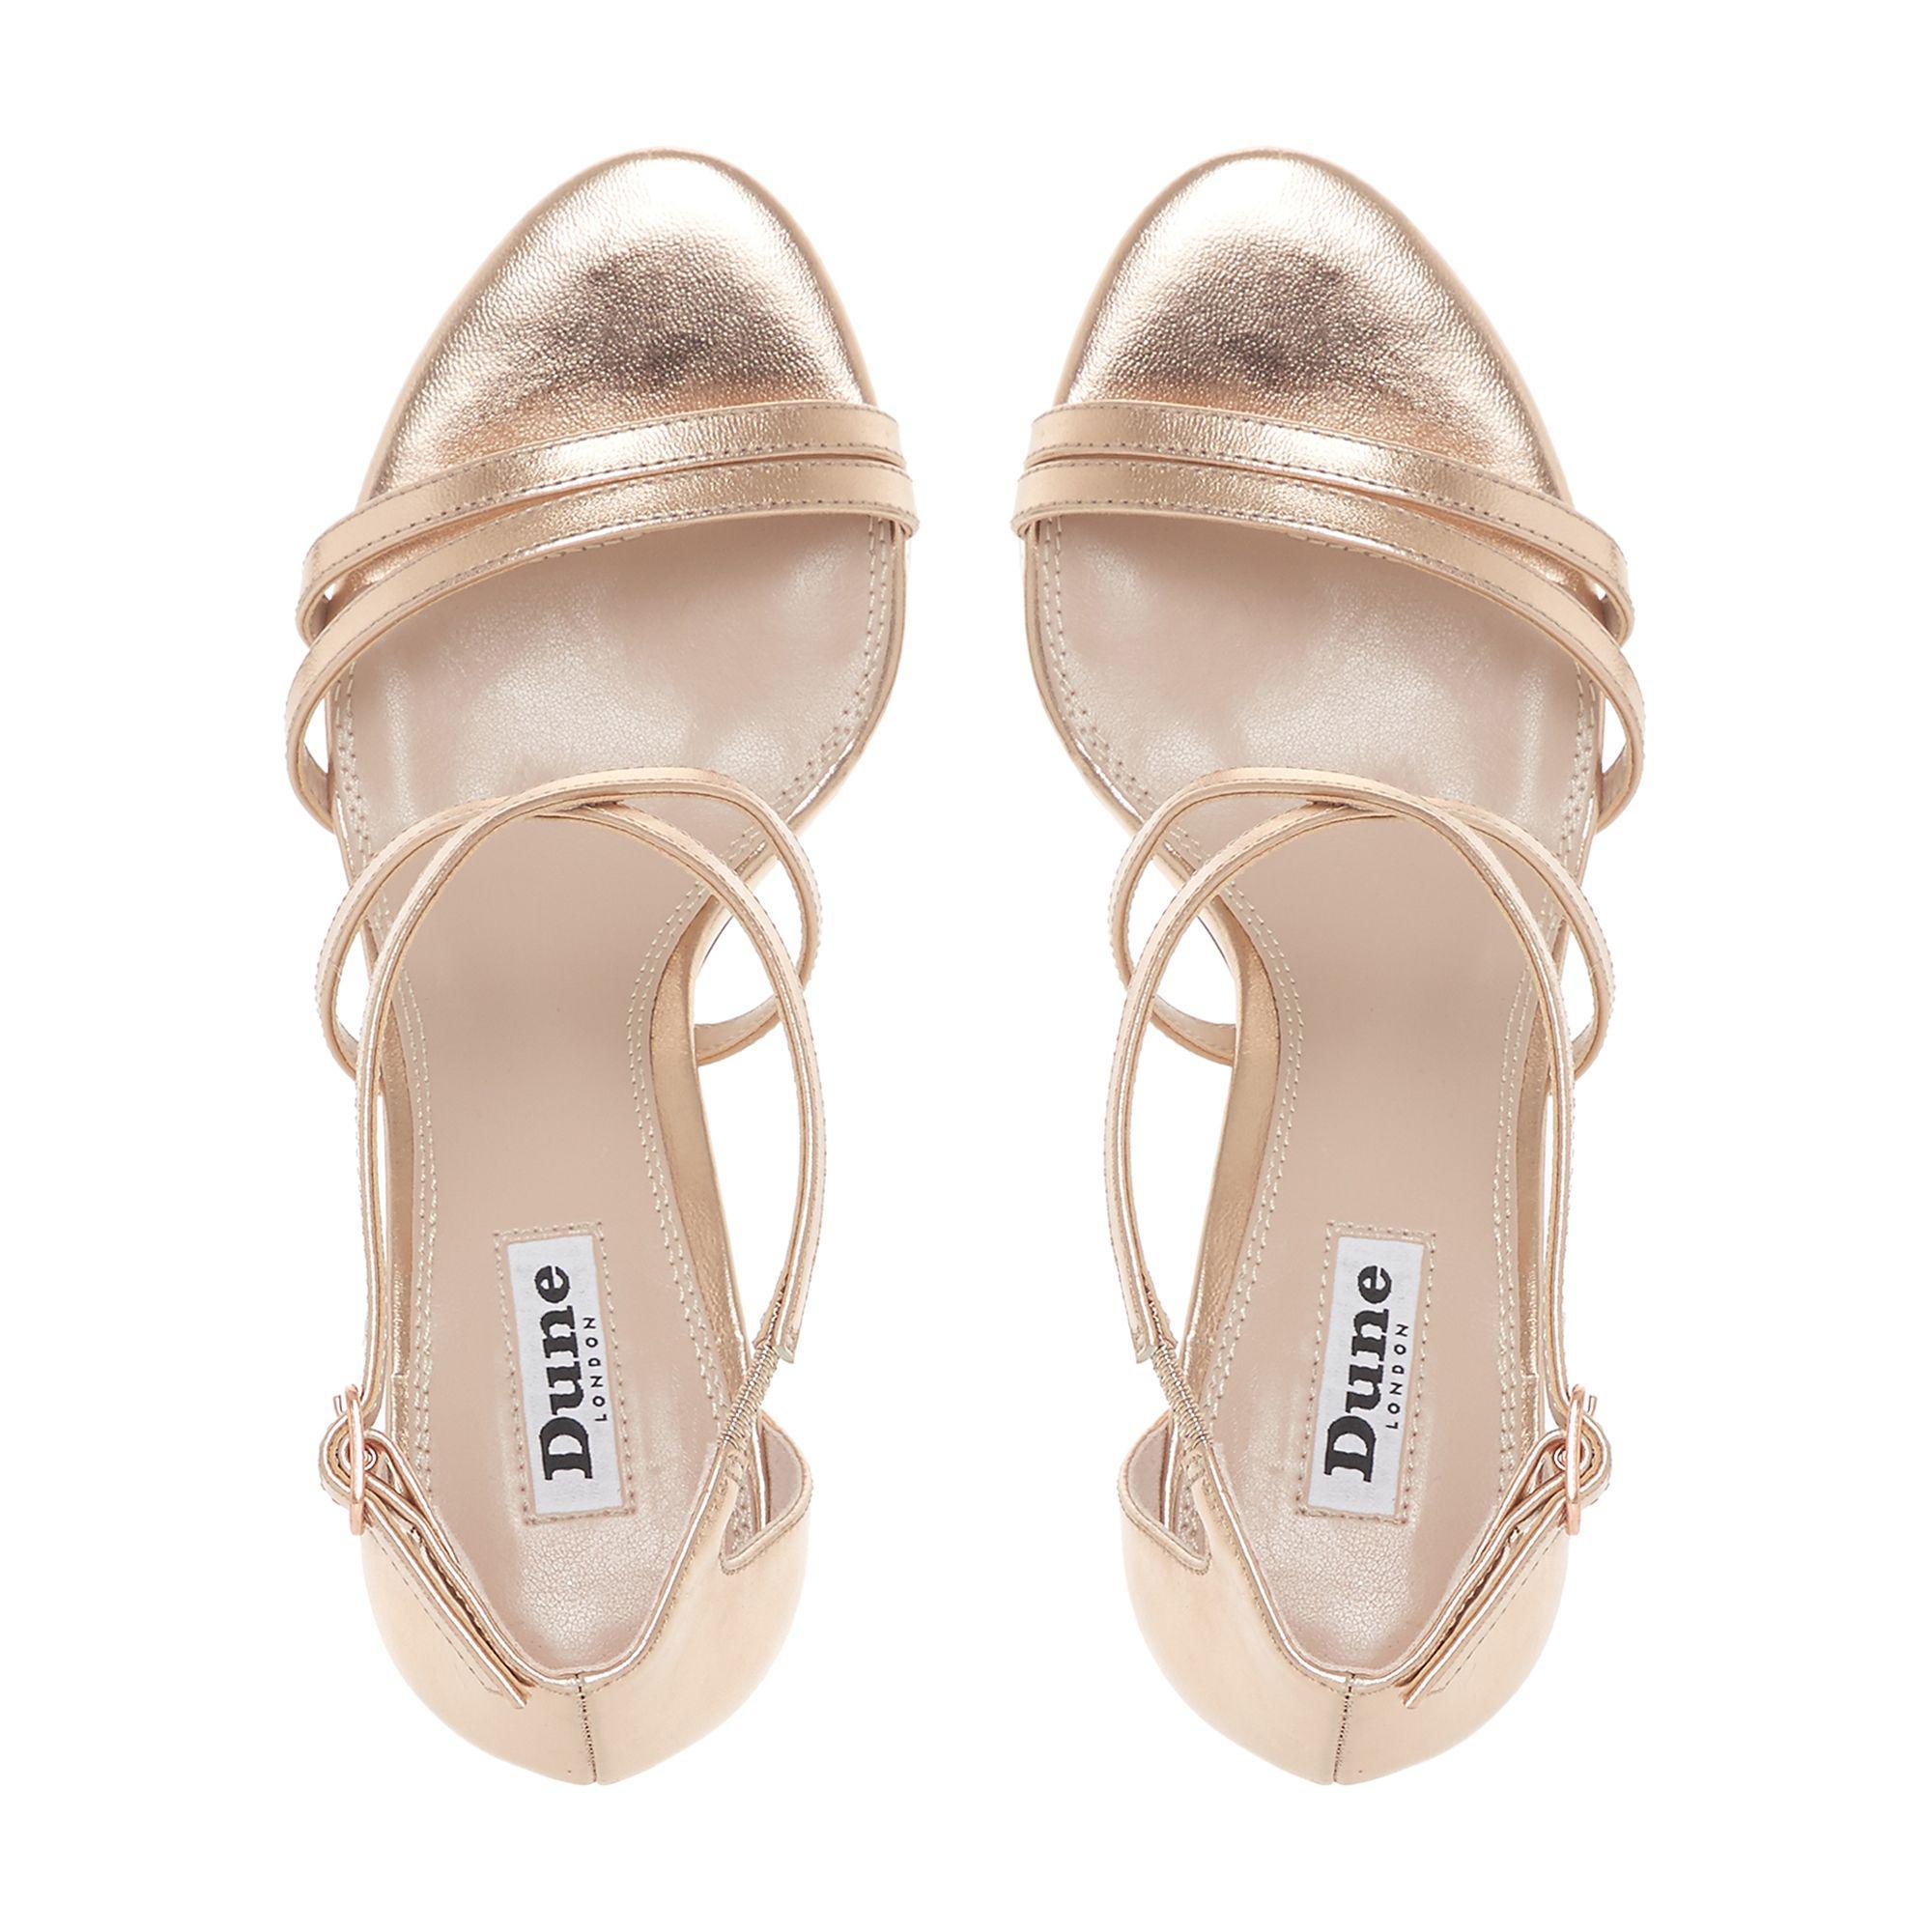 6cd068866 ... 'mariela' Ankle Strap Sandals - Lyst. View fullscreen